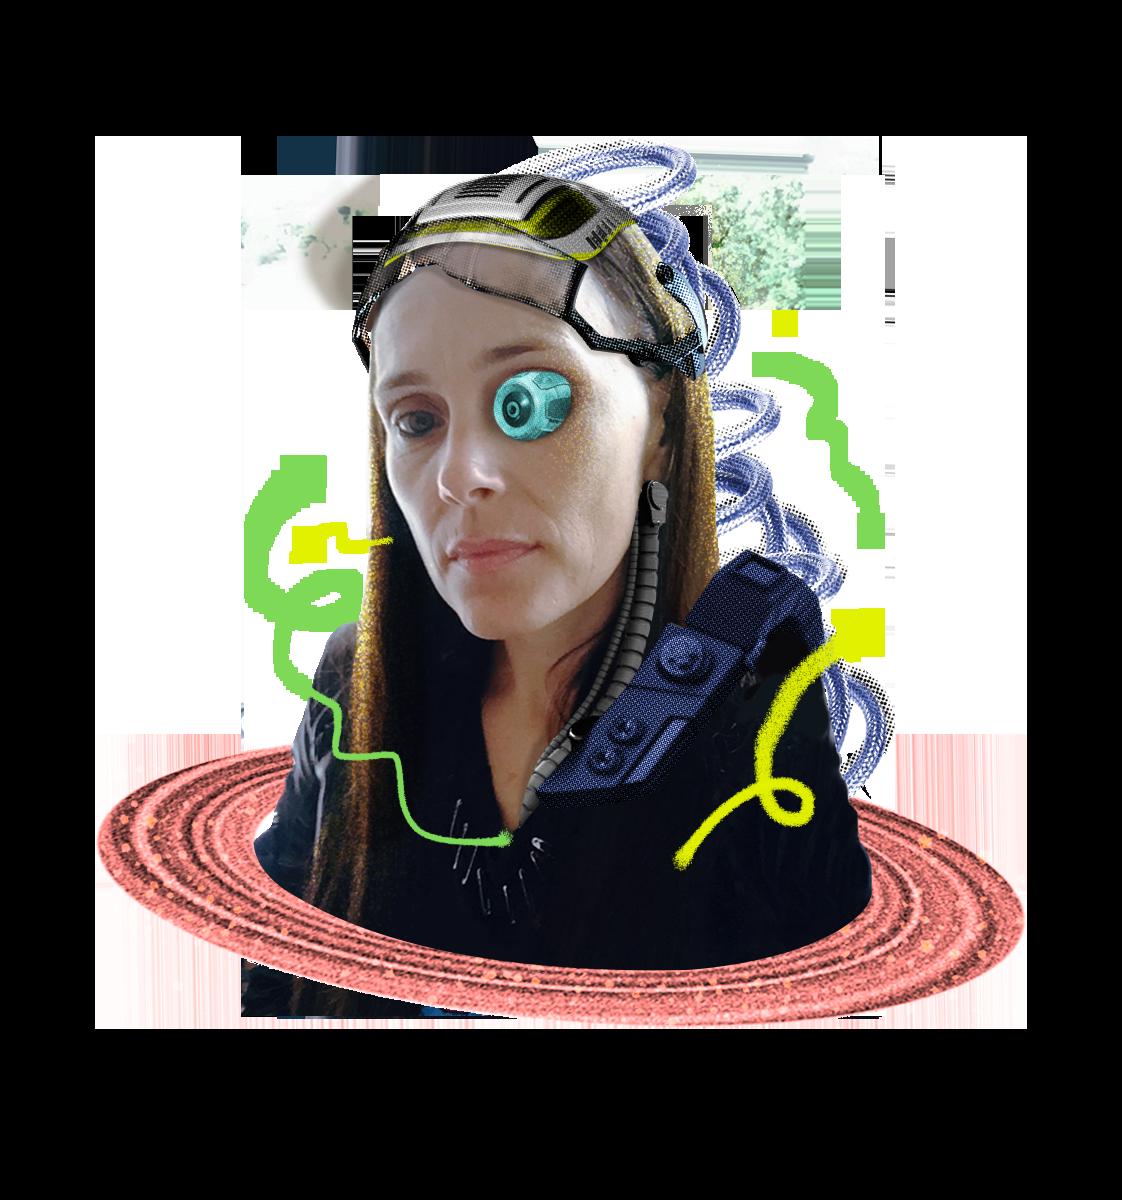 Augmented Portrait of Stéphanie Bozino-Routier